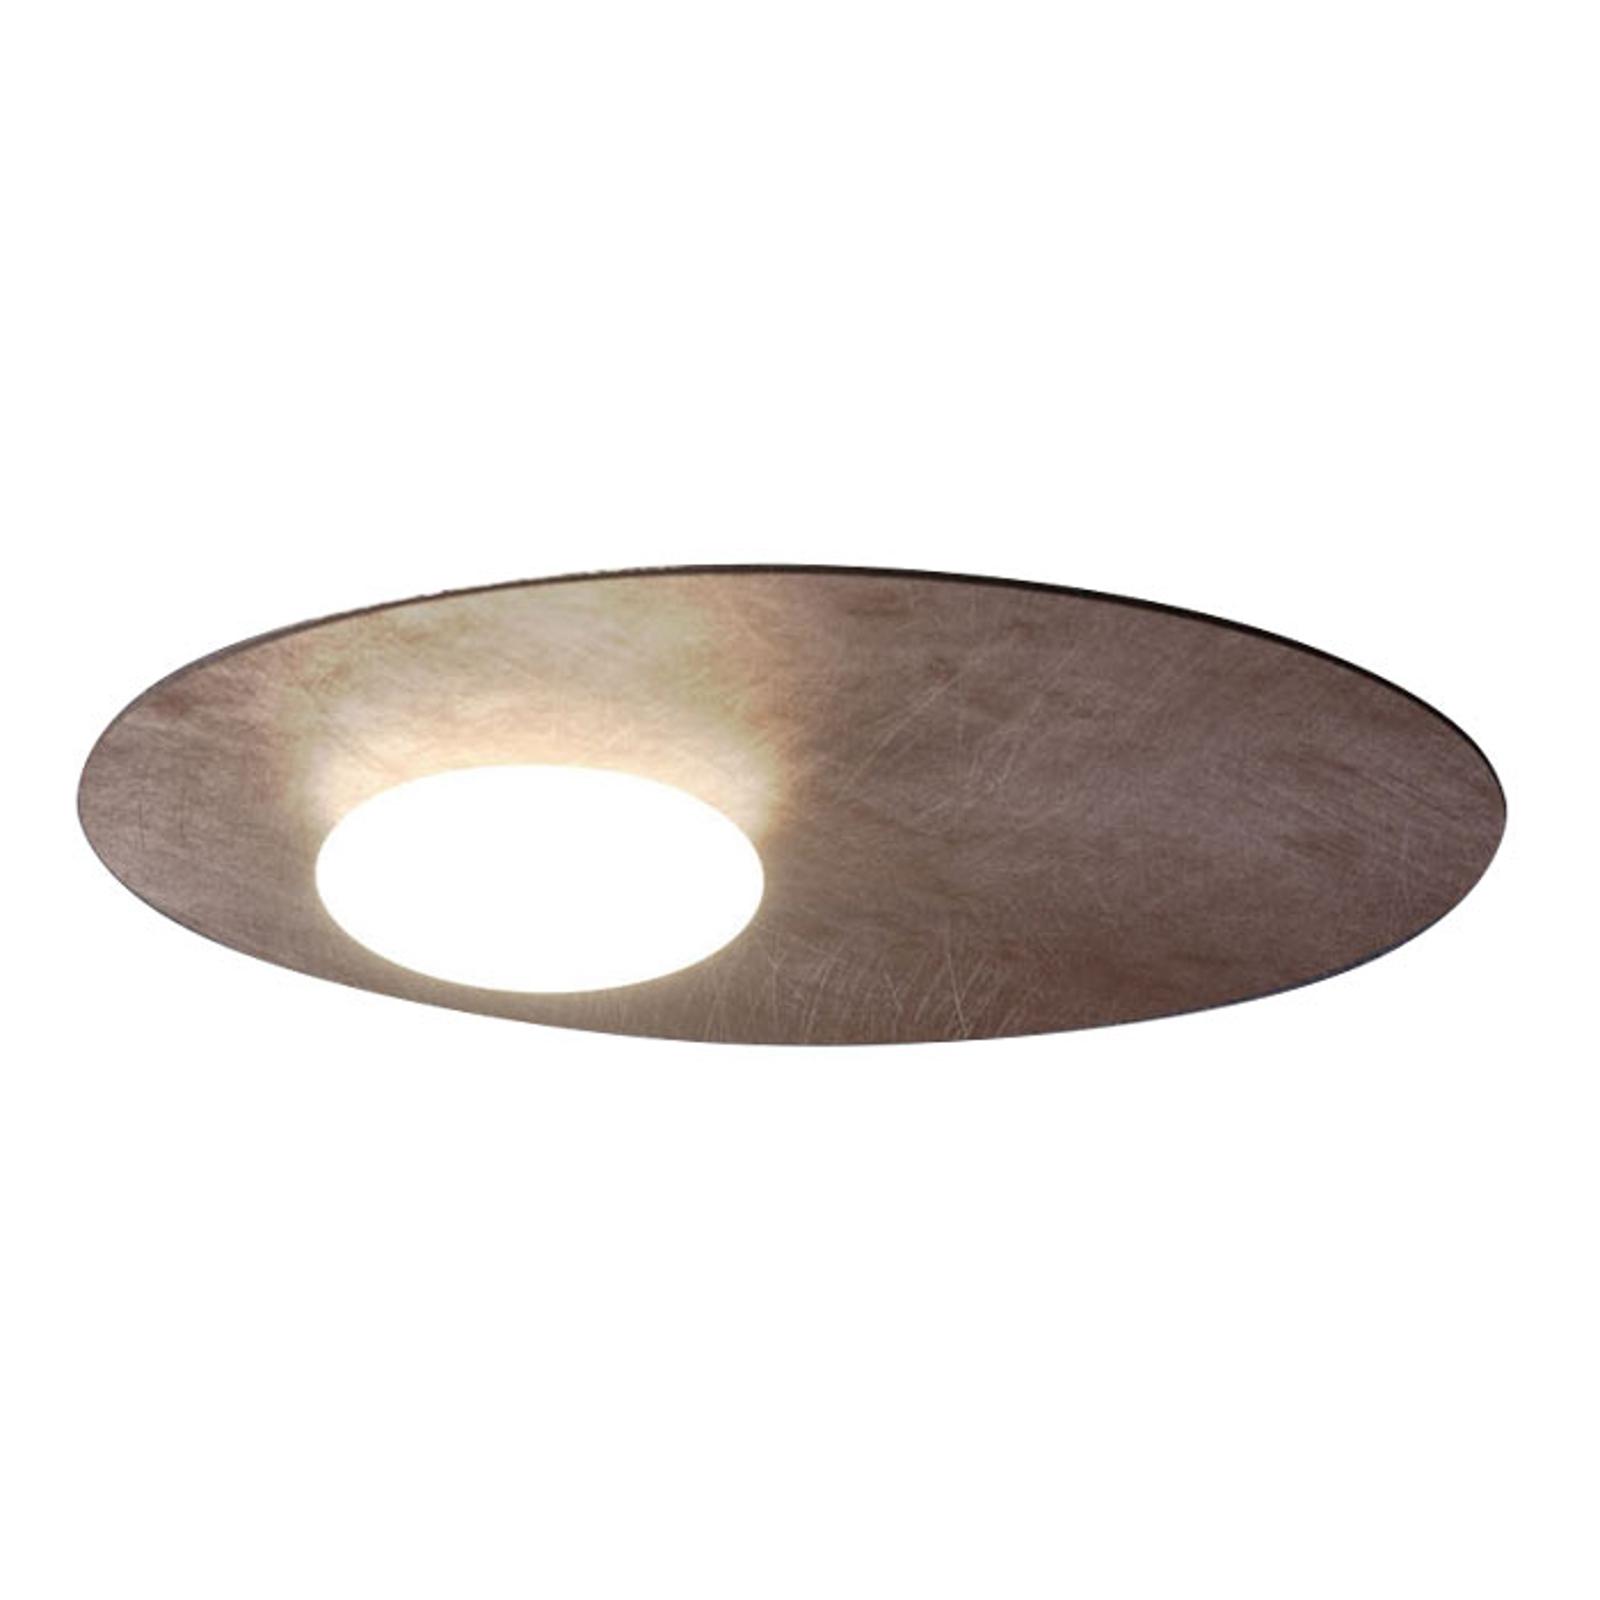 Axolight Kwic LED-Deckenleuchte, bronze Ø48cm